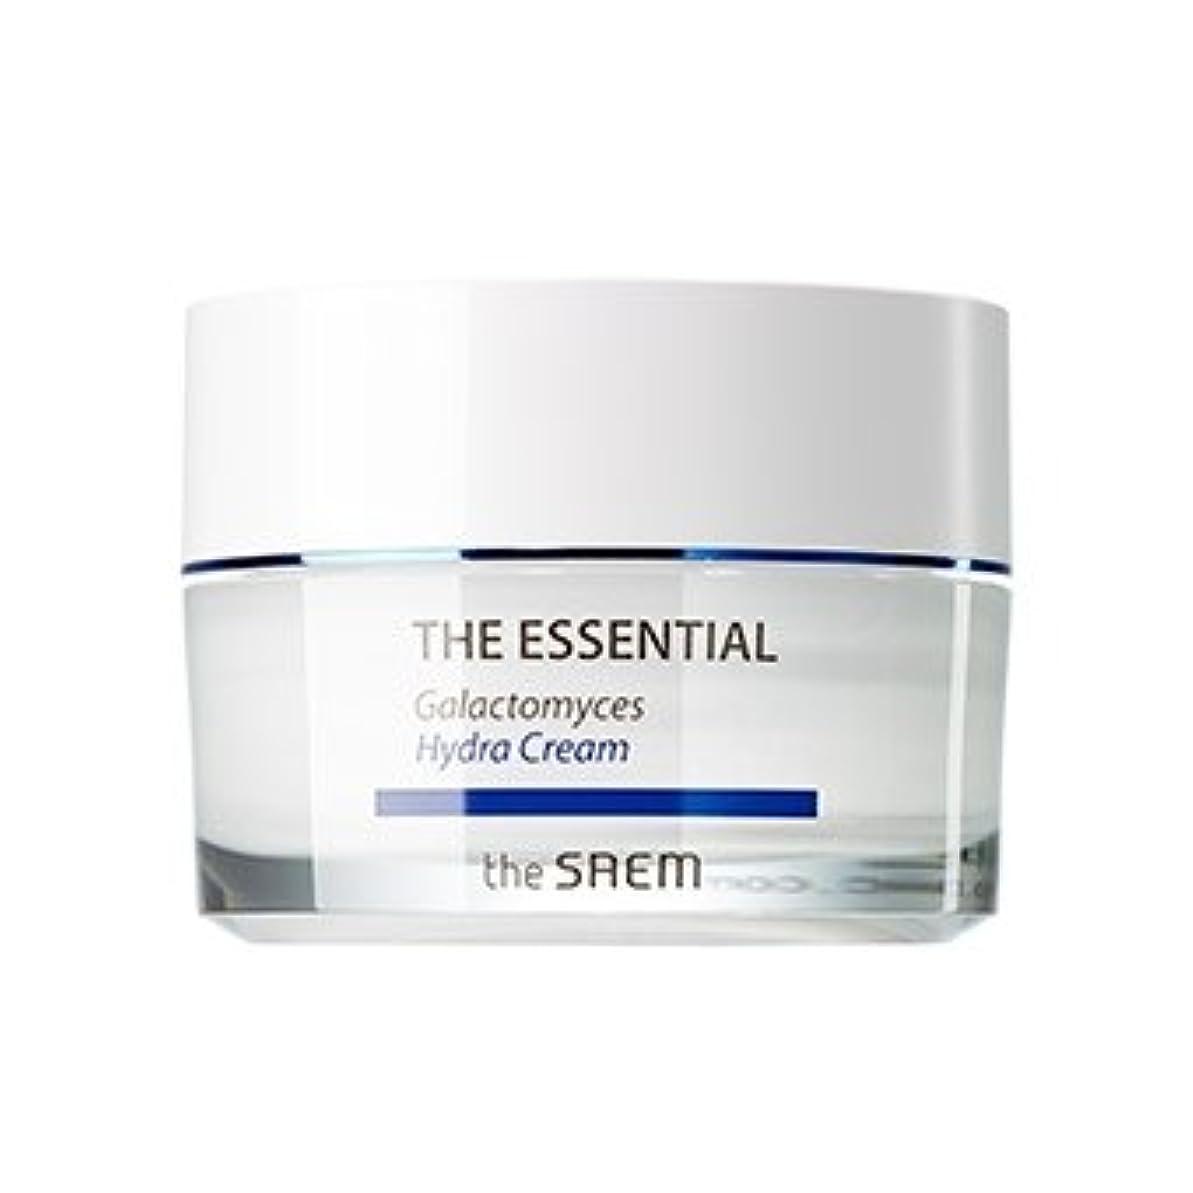 the SAEM The Essential Galactomyces Hydra Cream 50ml/ザセム ザ エッセンシャル ガラクトミセス ハイドラ クリーム 50ml [並行輸入品]